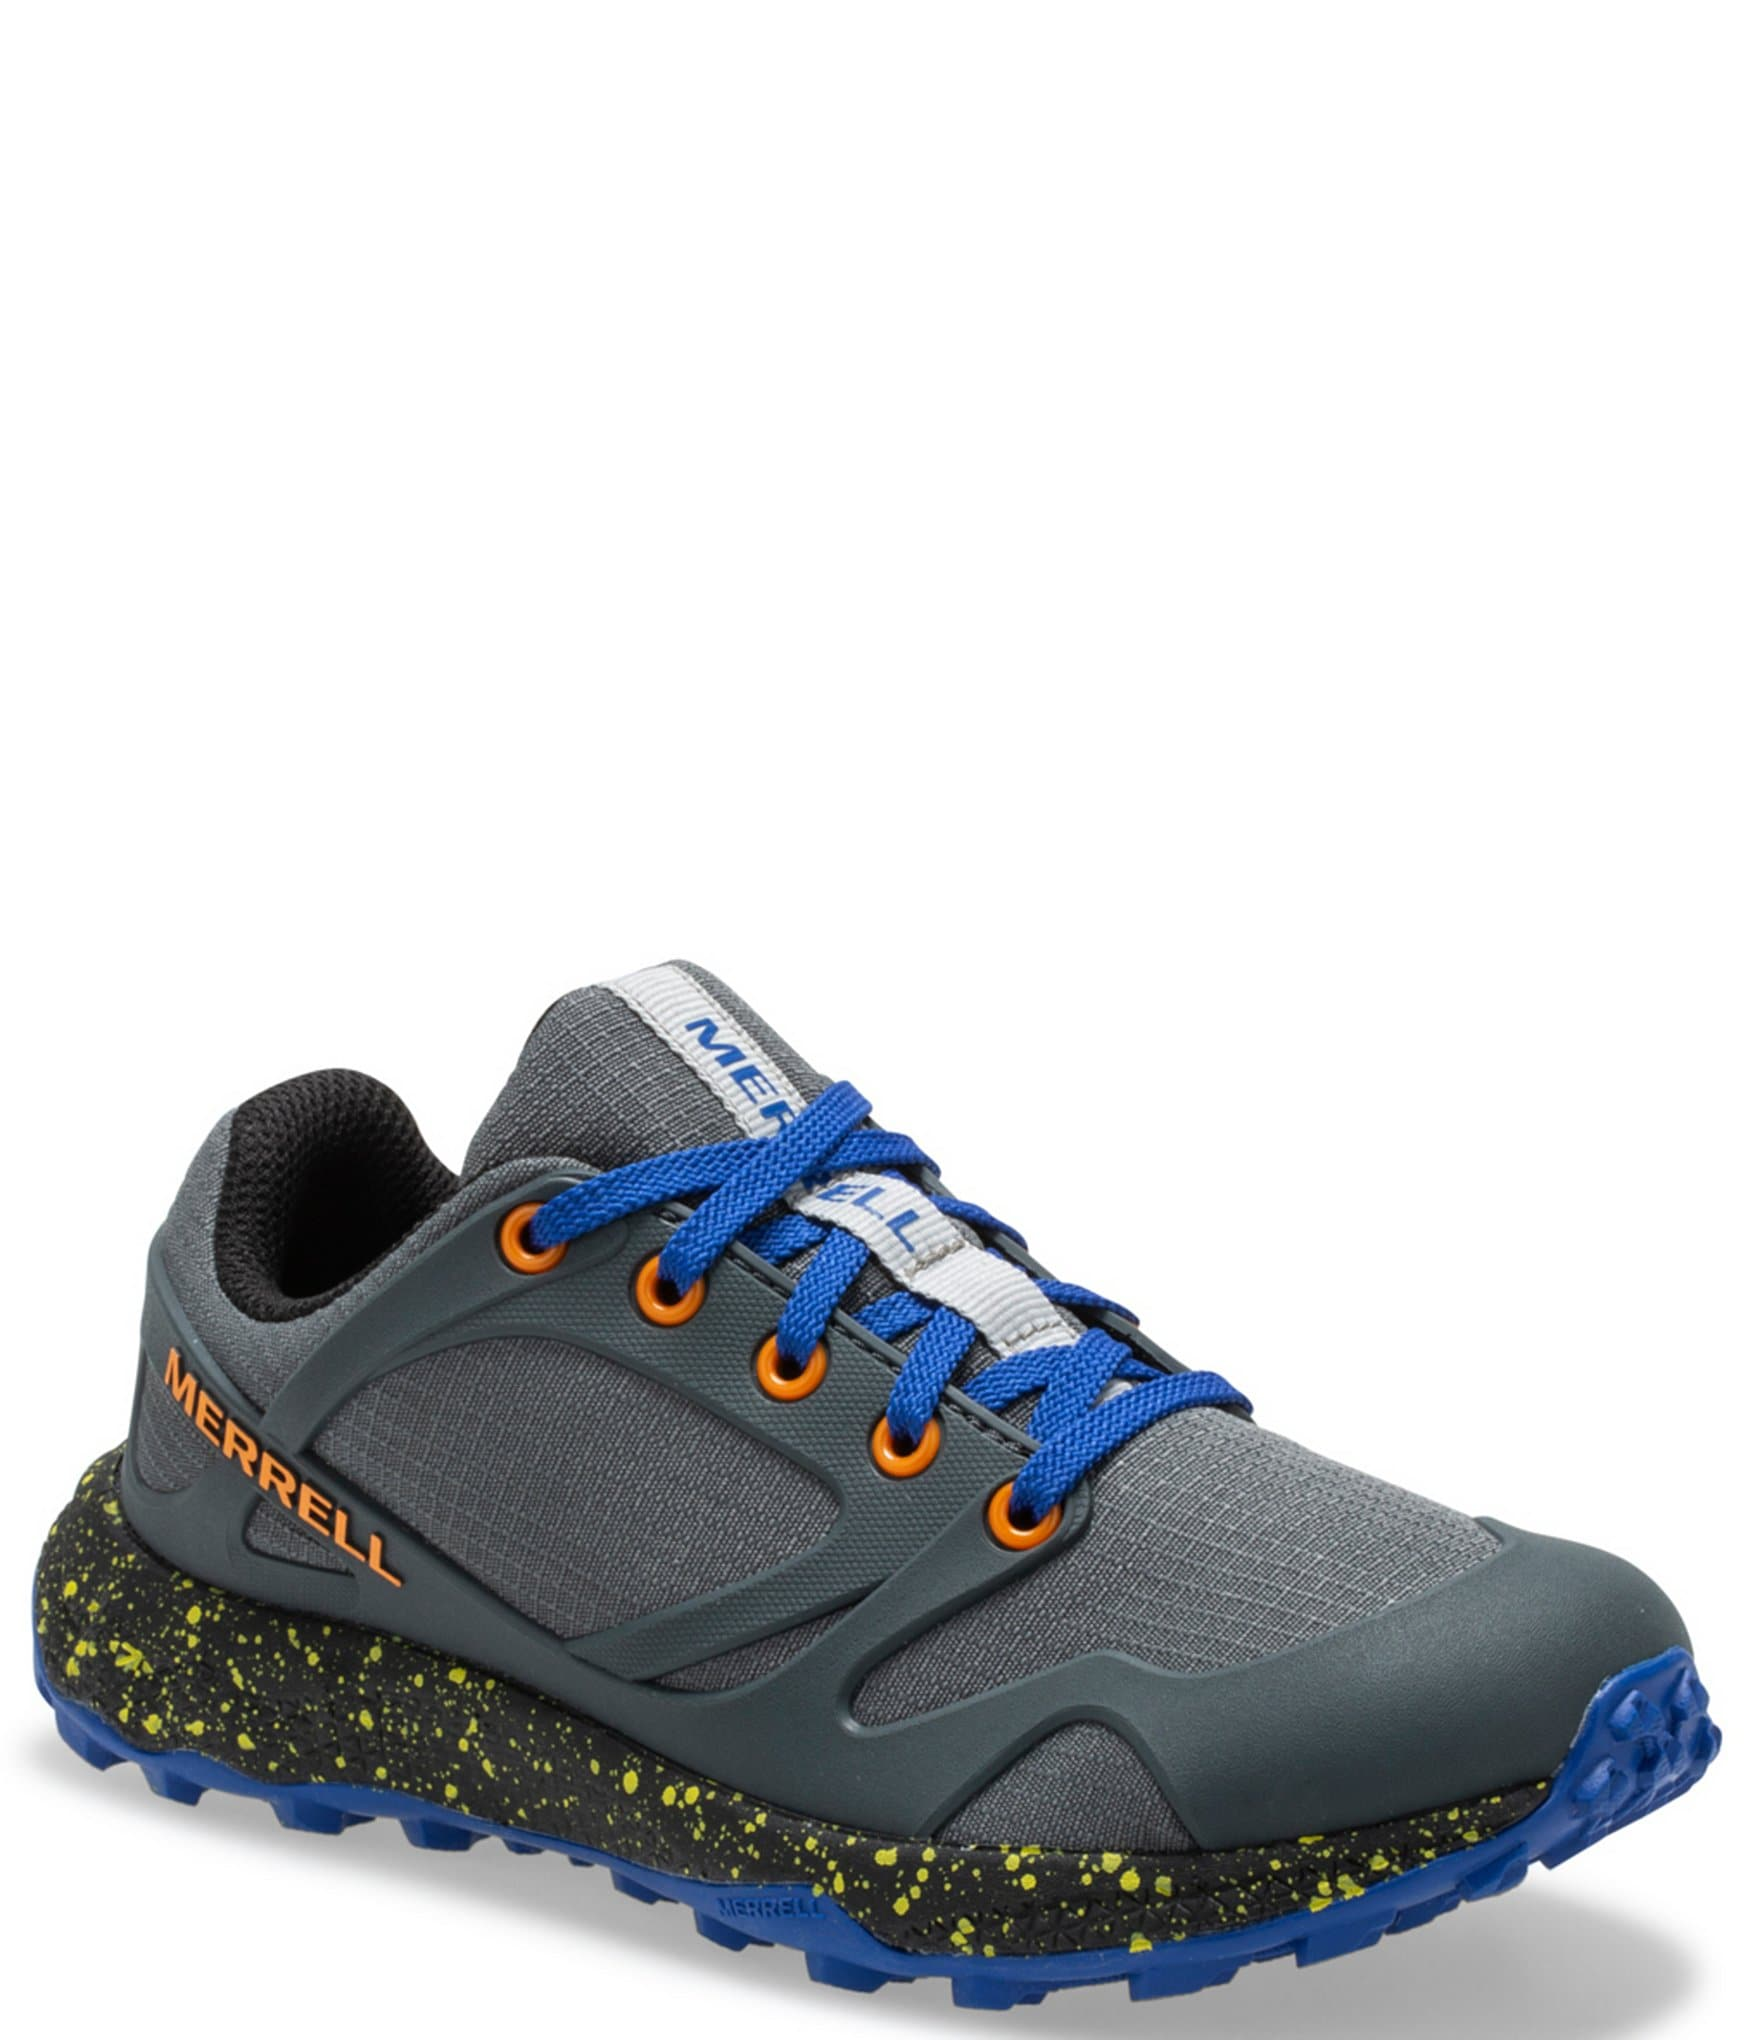 Merrell Boys' Altalight Low Sneakers